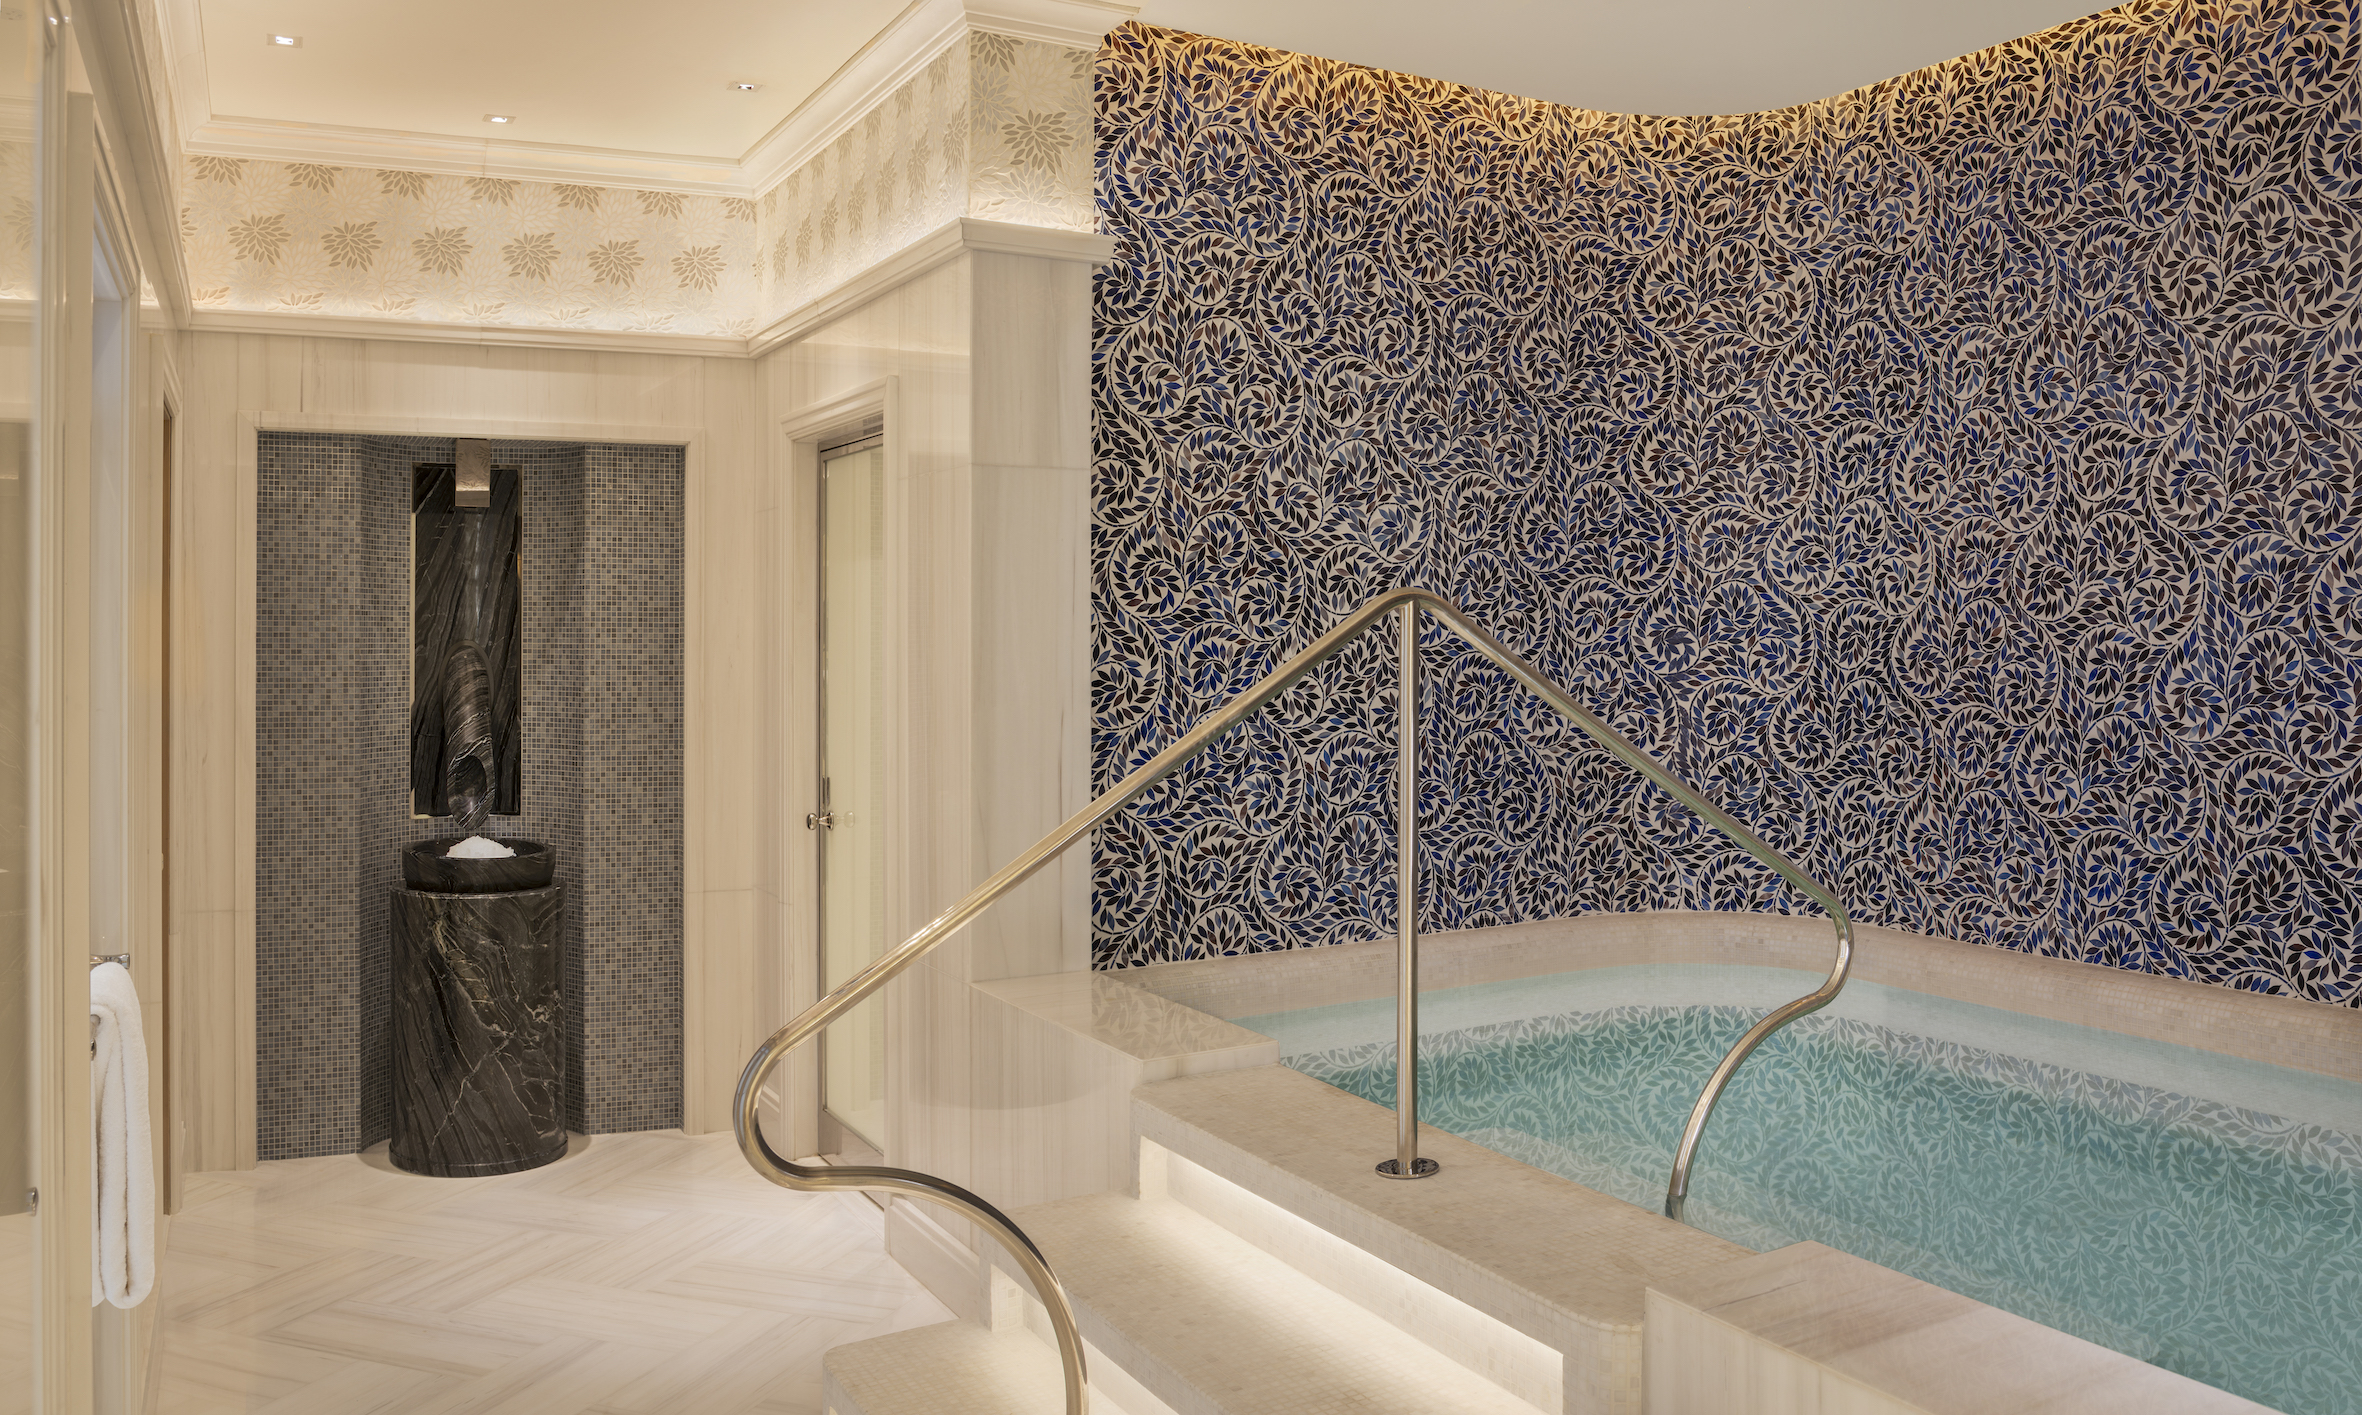 The 10 most romantic spas in Singapore